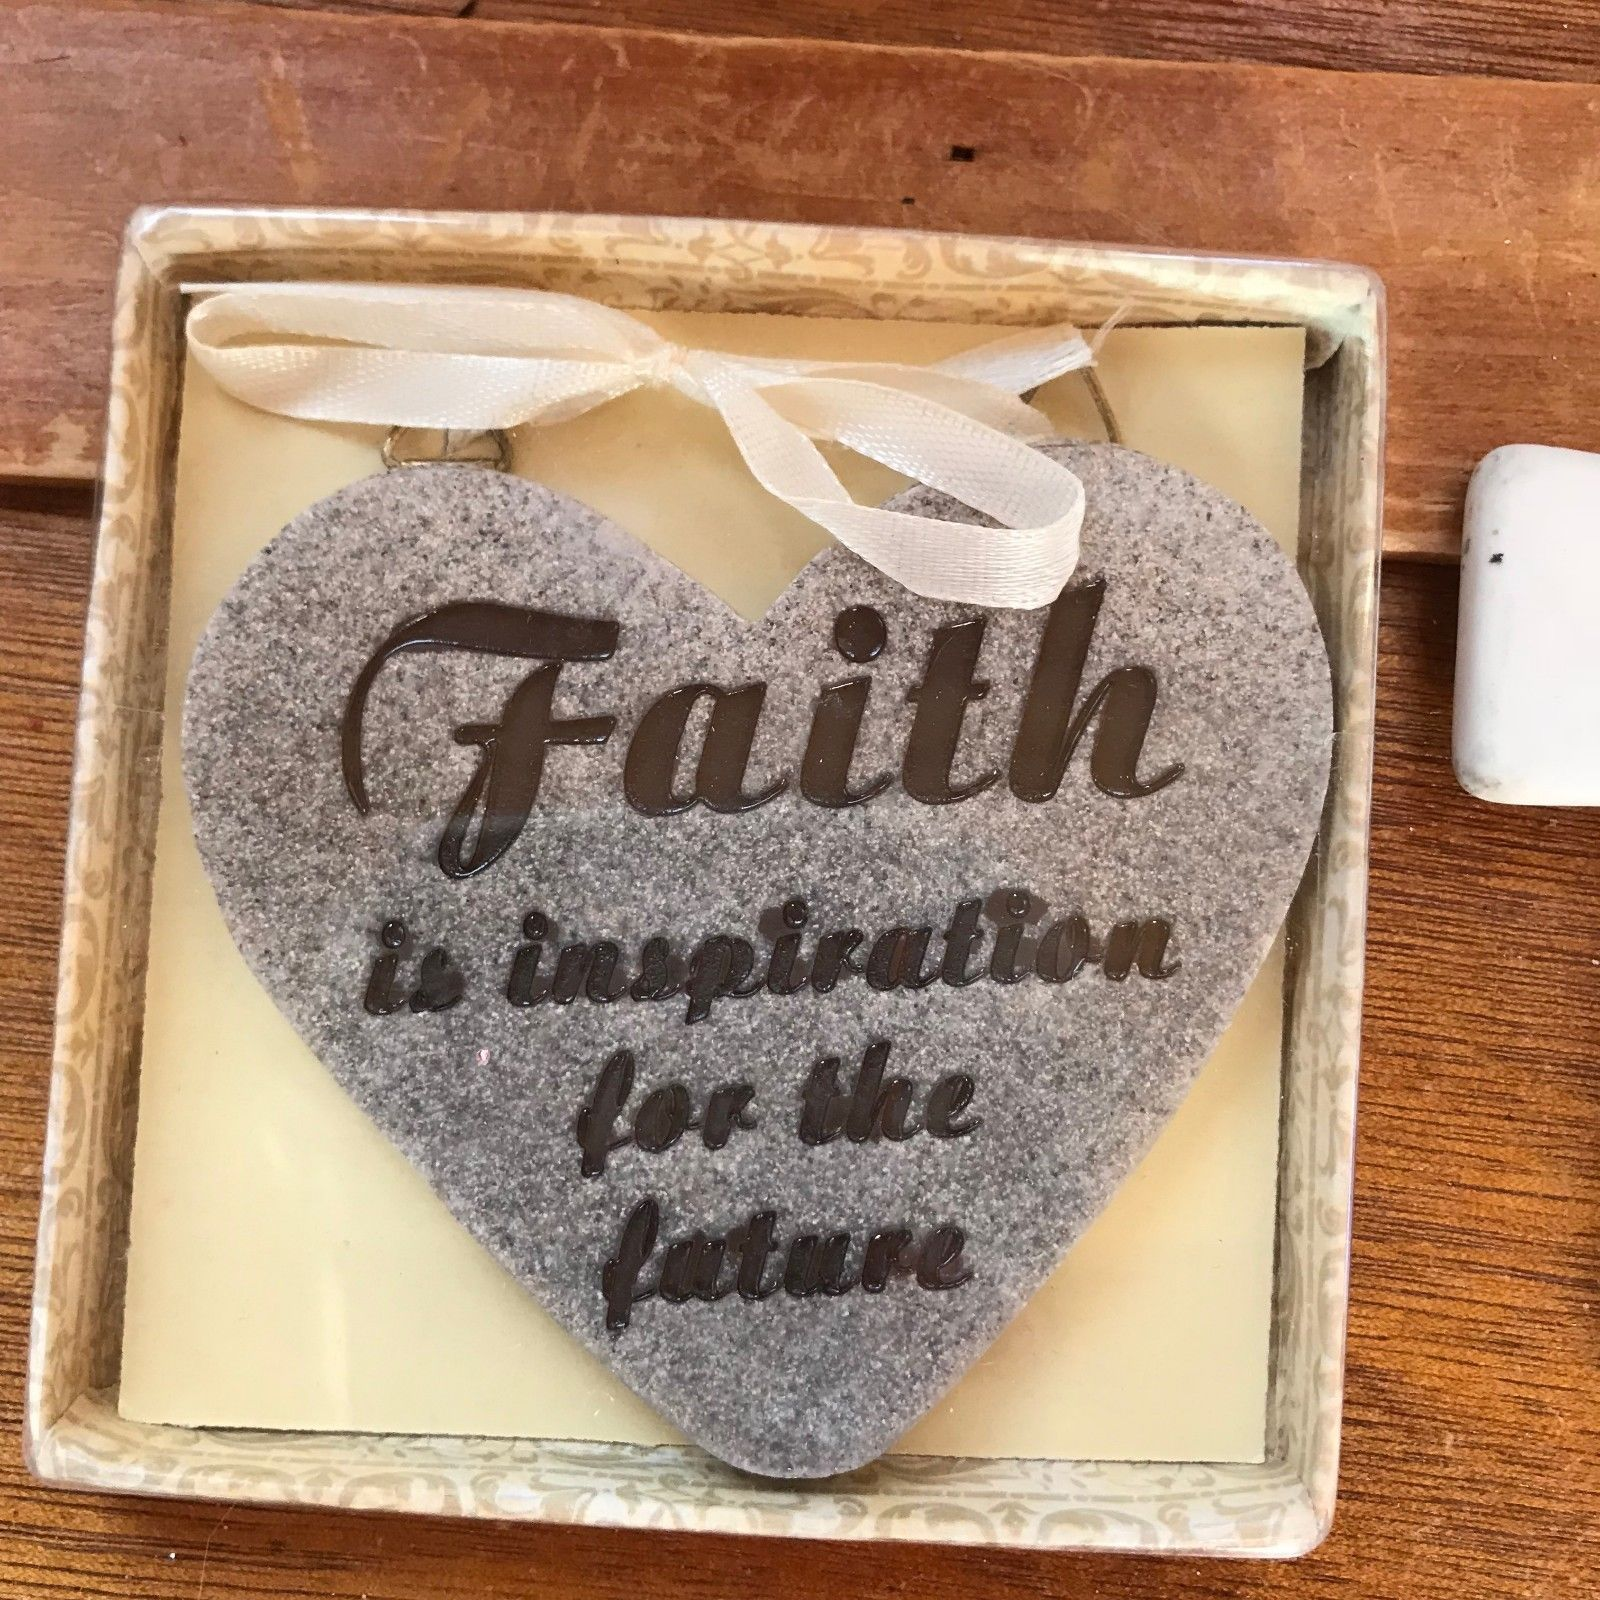 Lot of 2 Stone Tan Heart & White Porcelain Cross with FAITH Religious Christmas